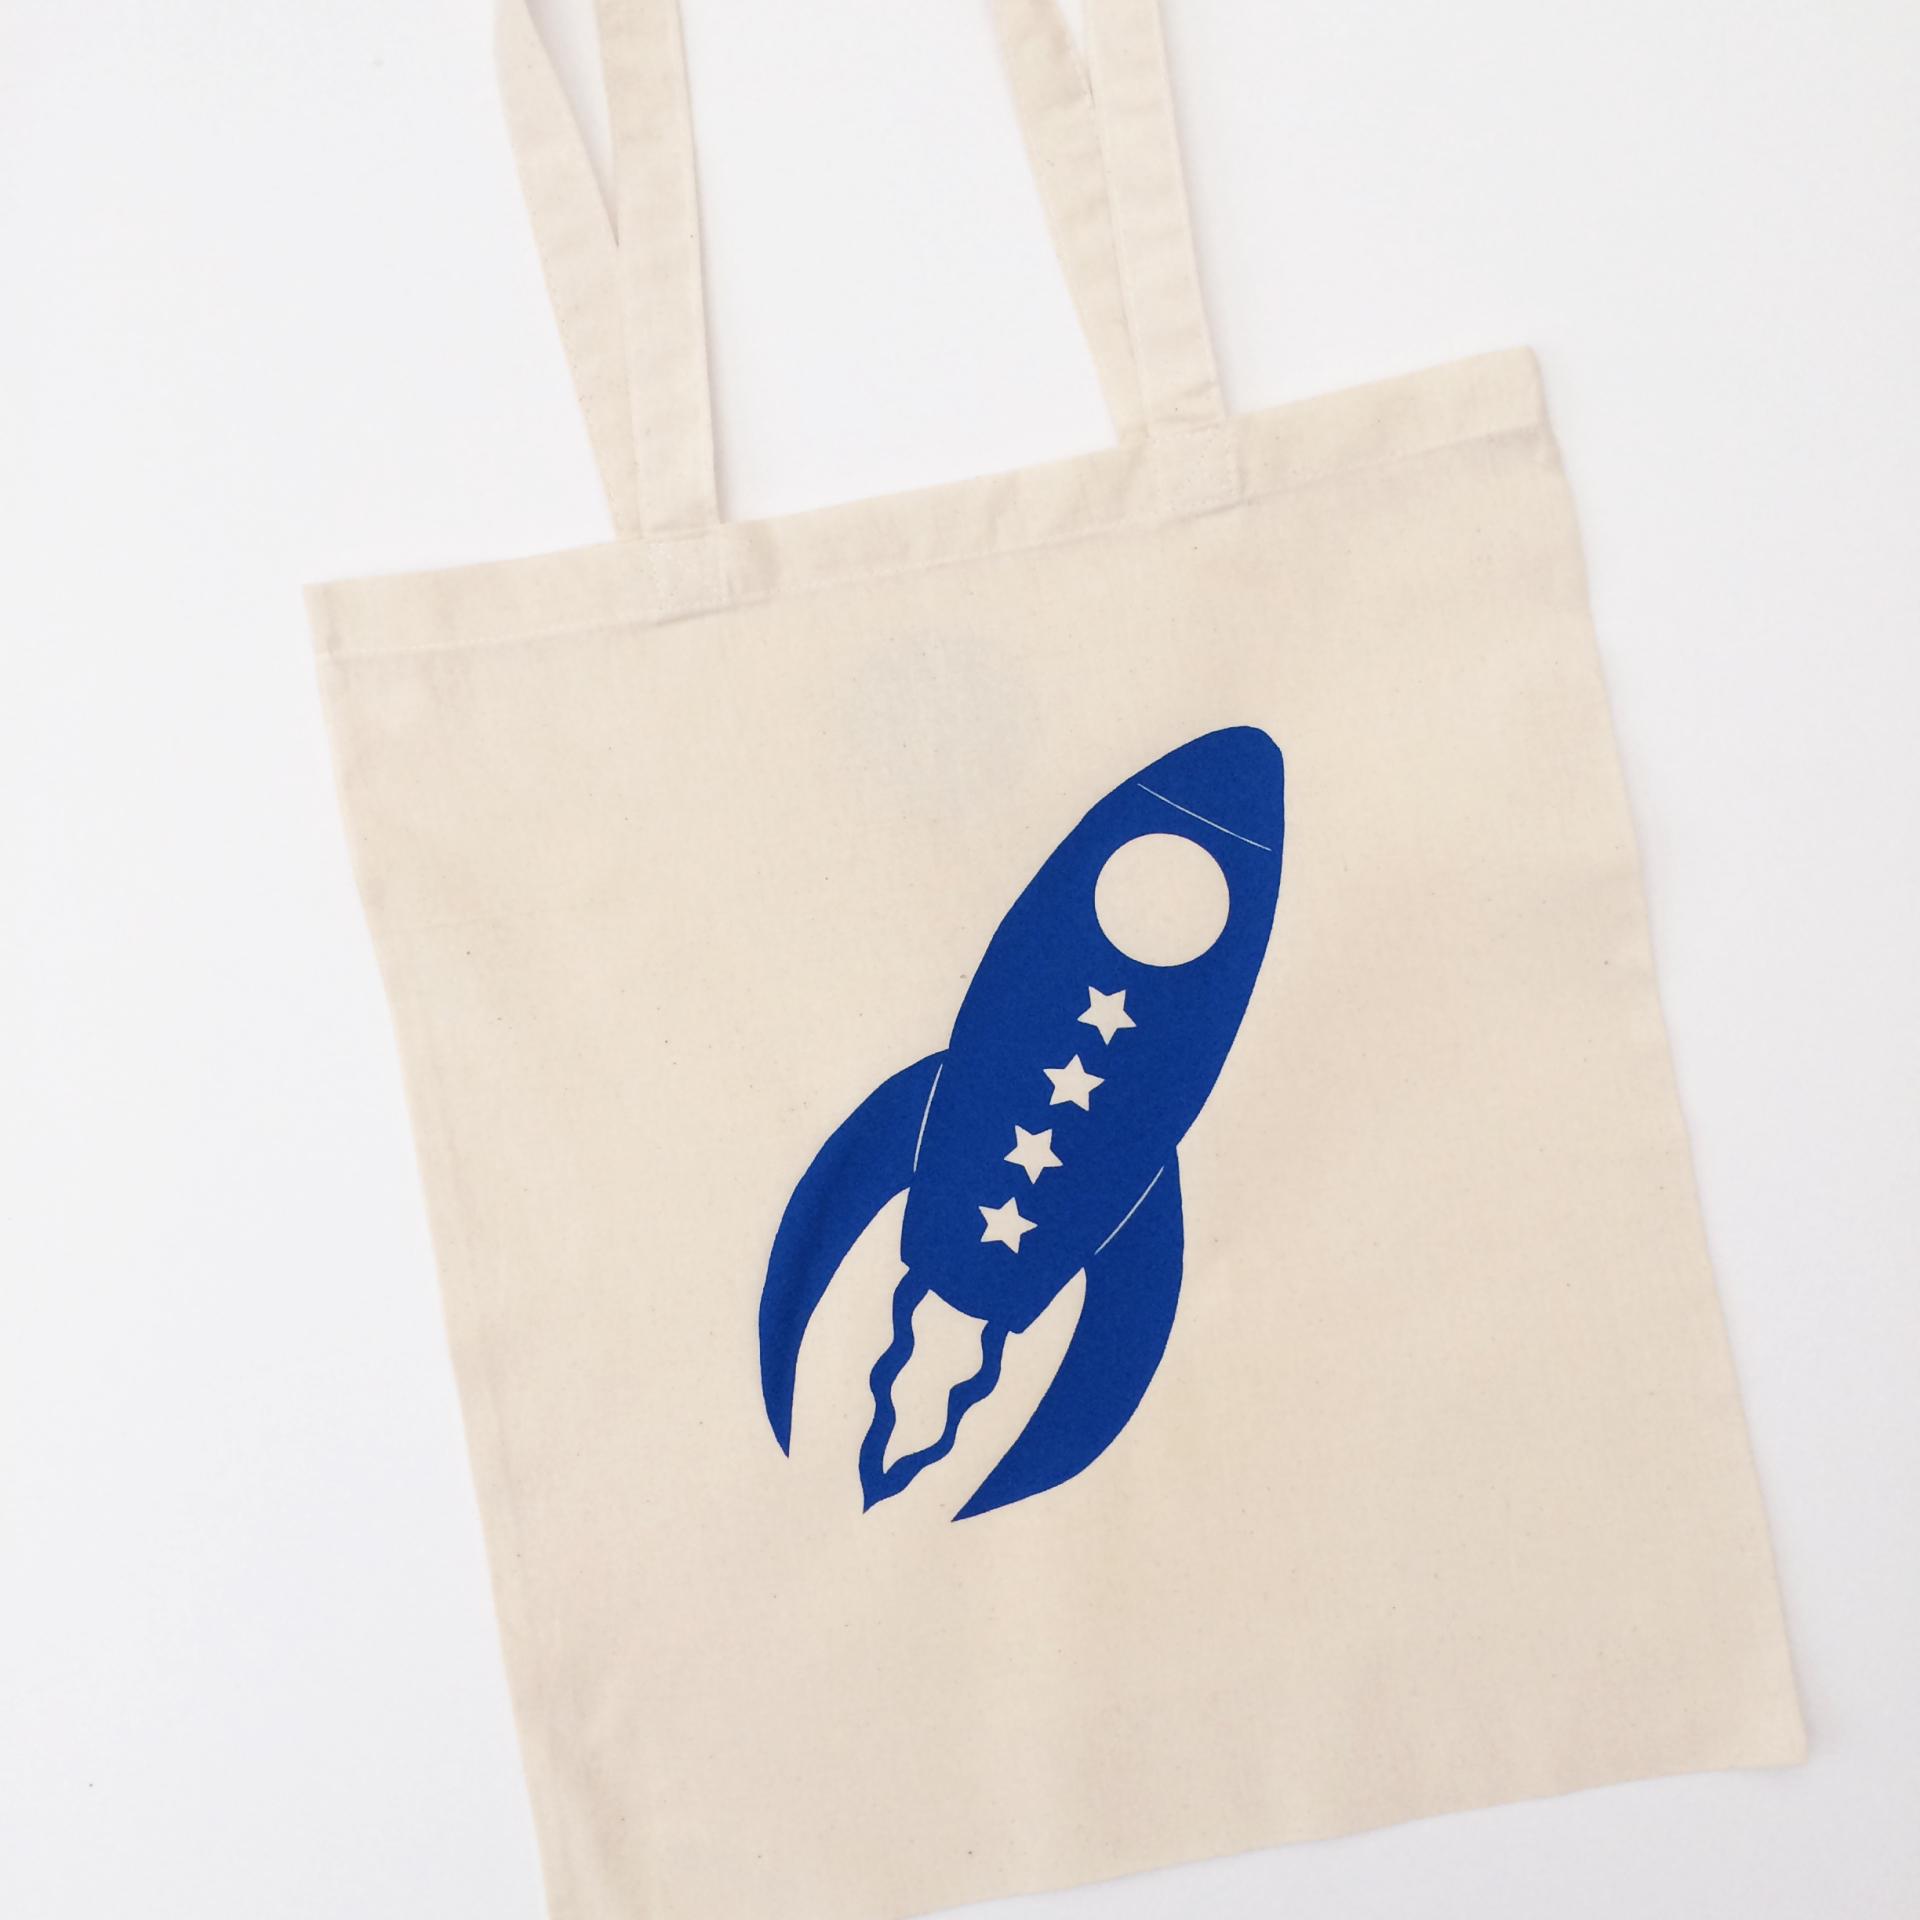 Rocket - £6